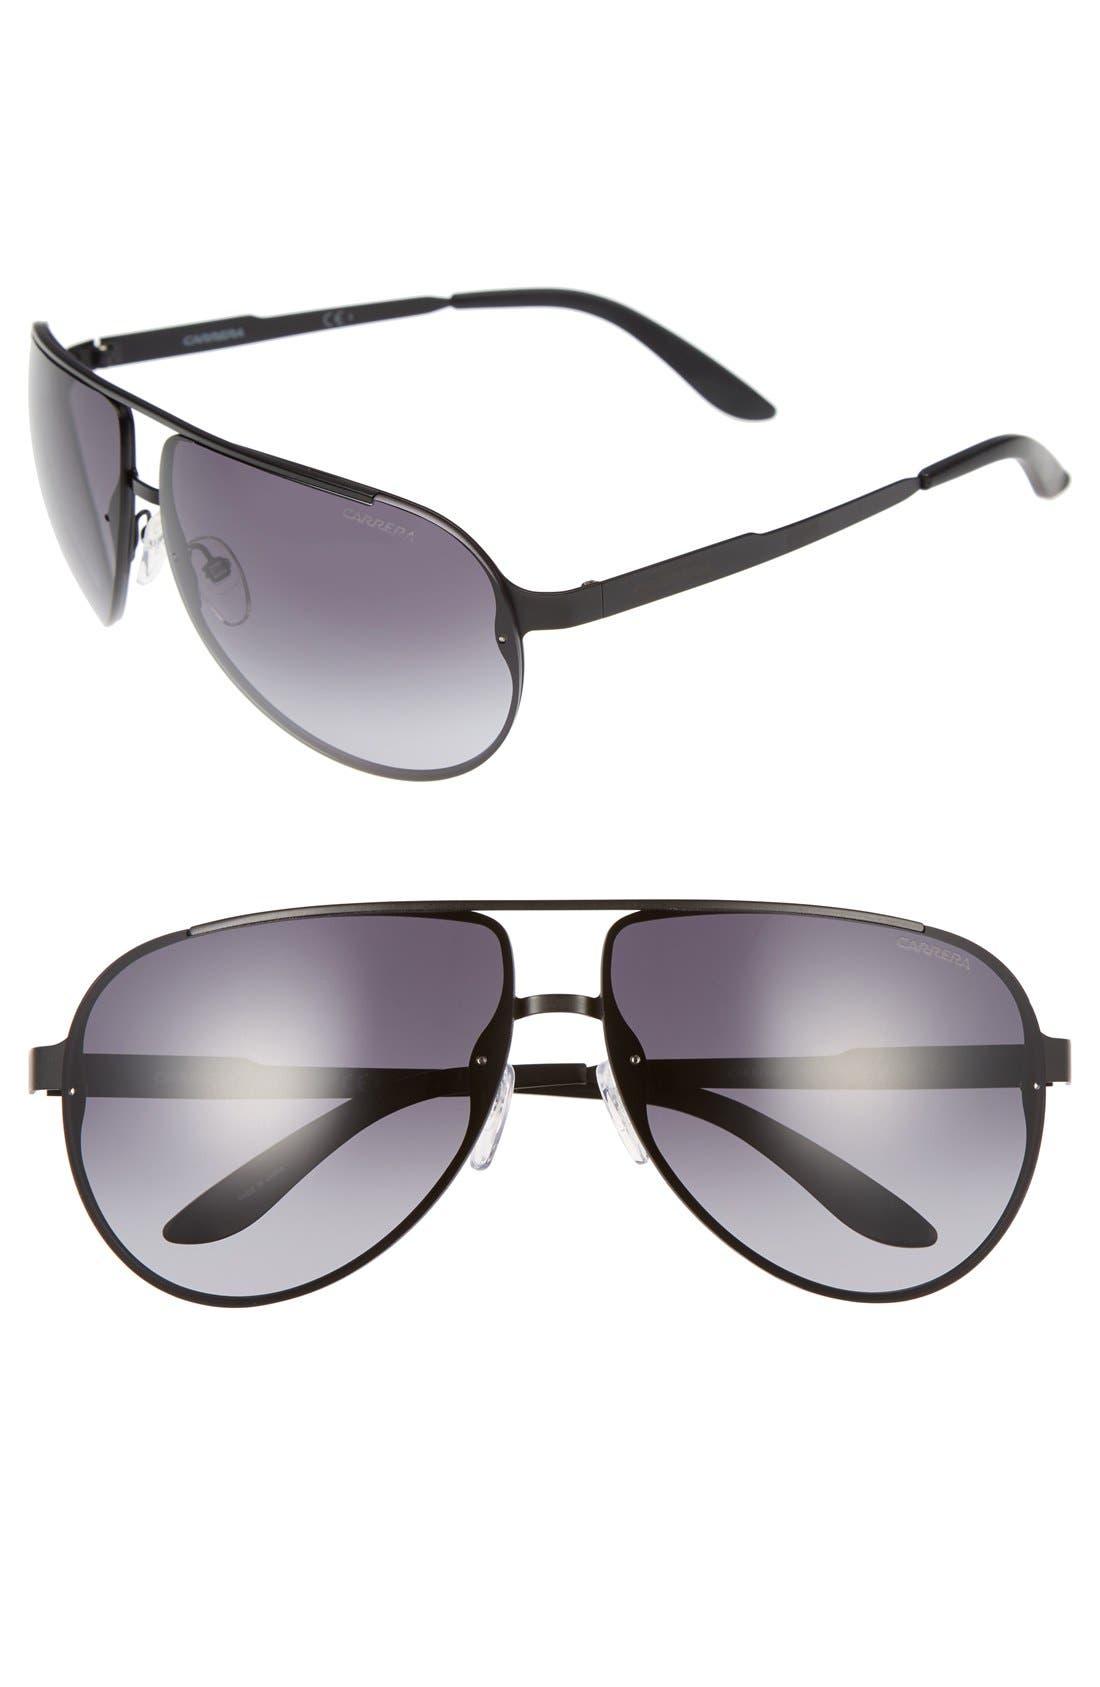 CA102 65mm Aviator Sunglasses,                             Alternate thumbnail 4, color,                             001